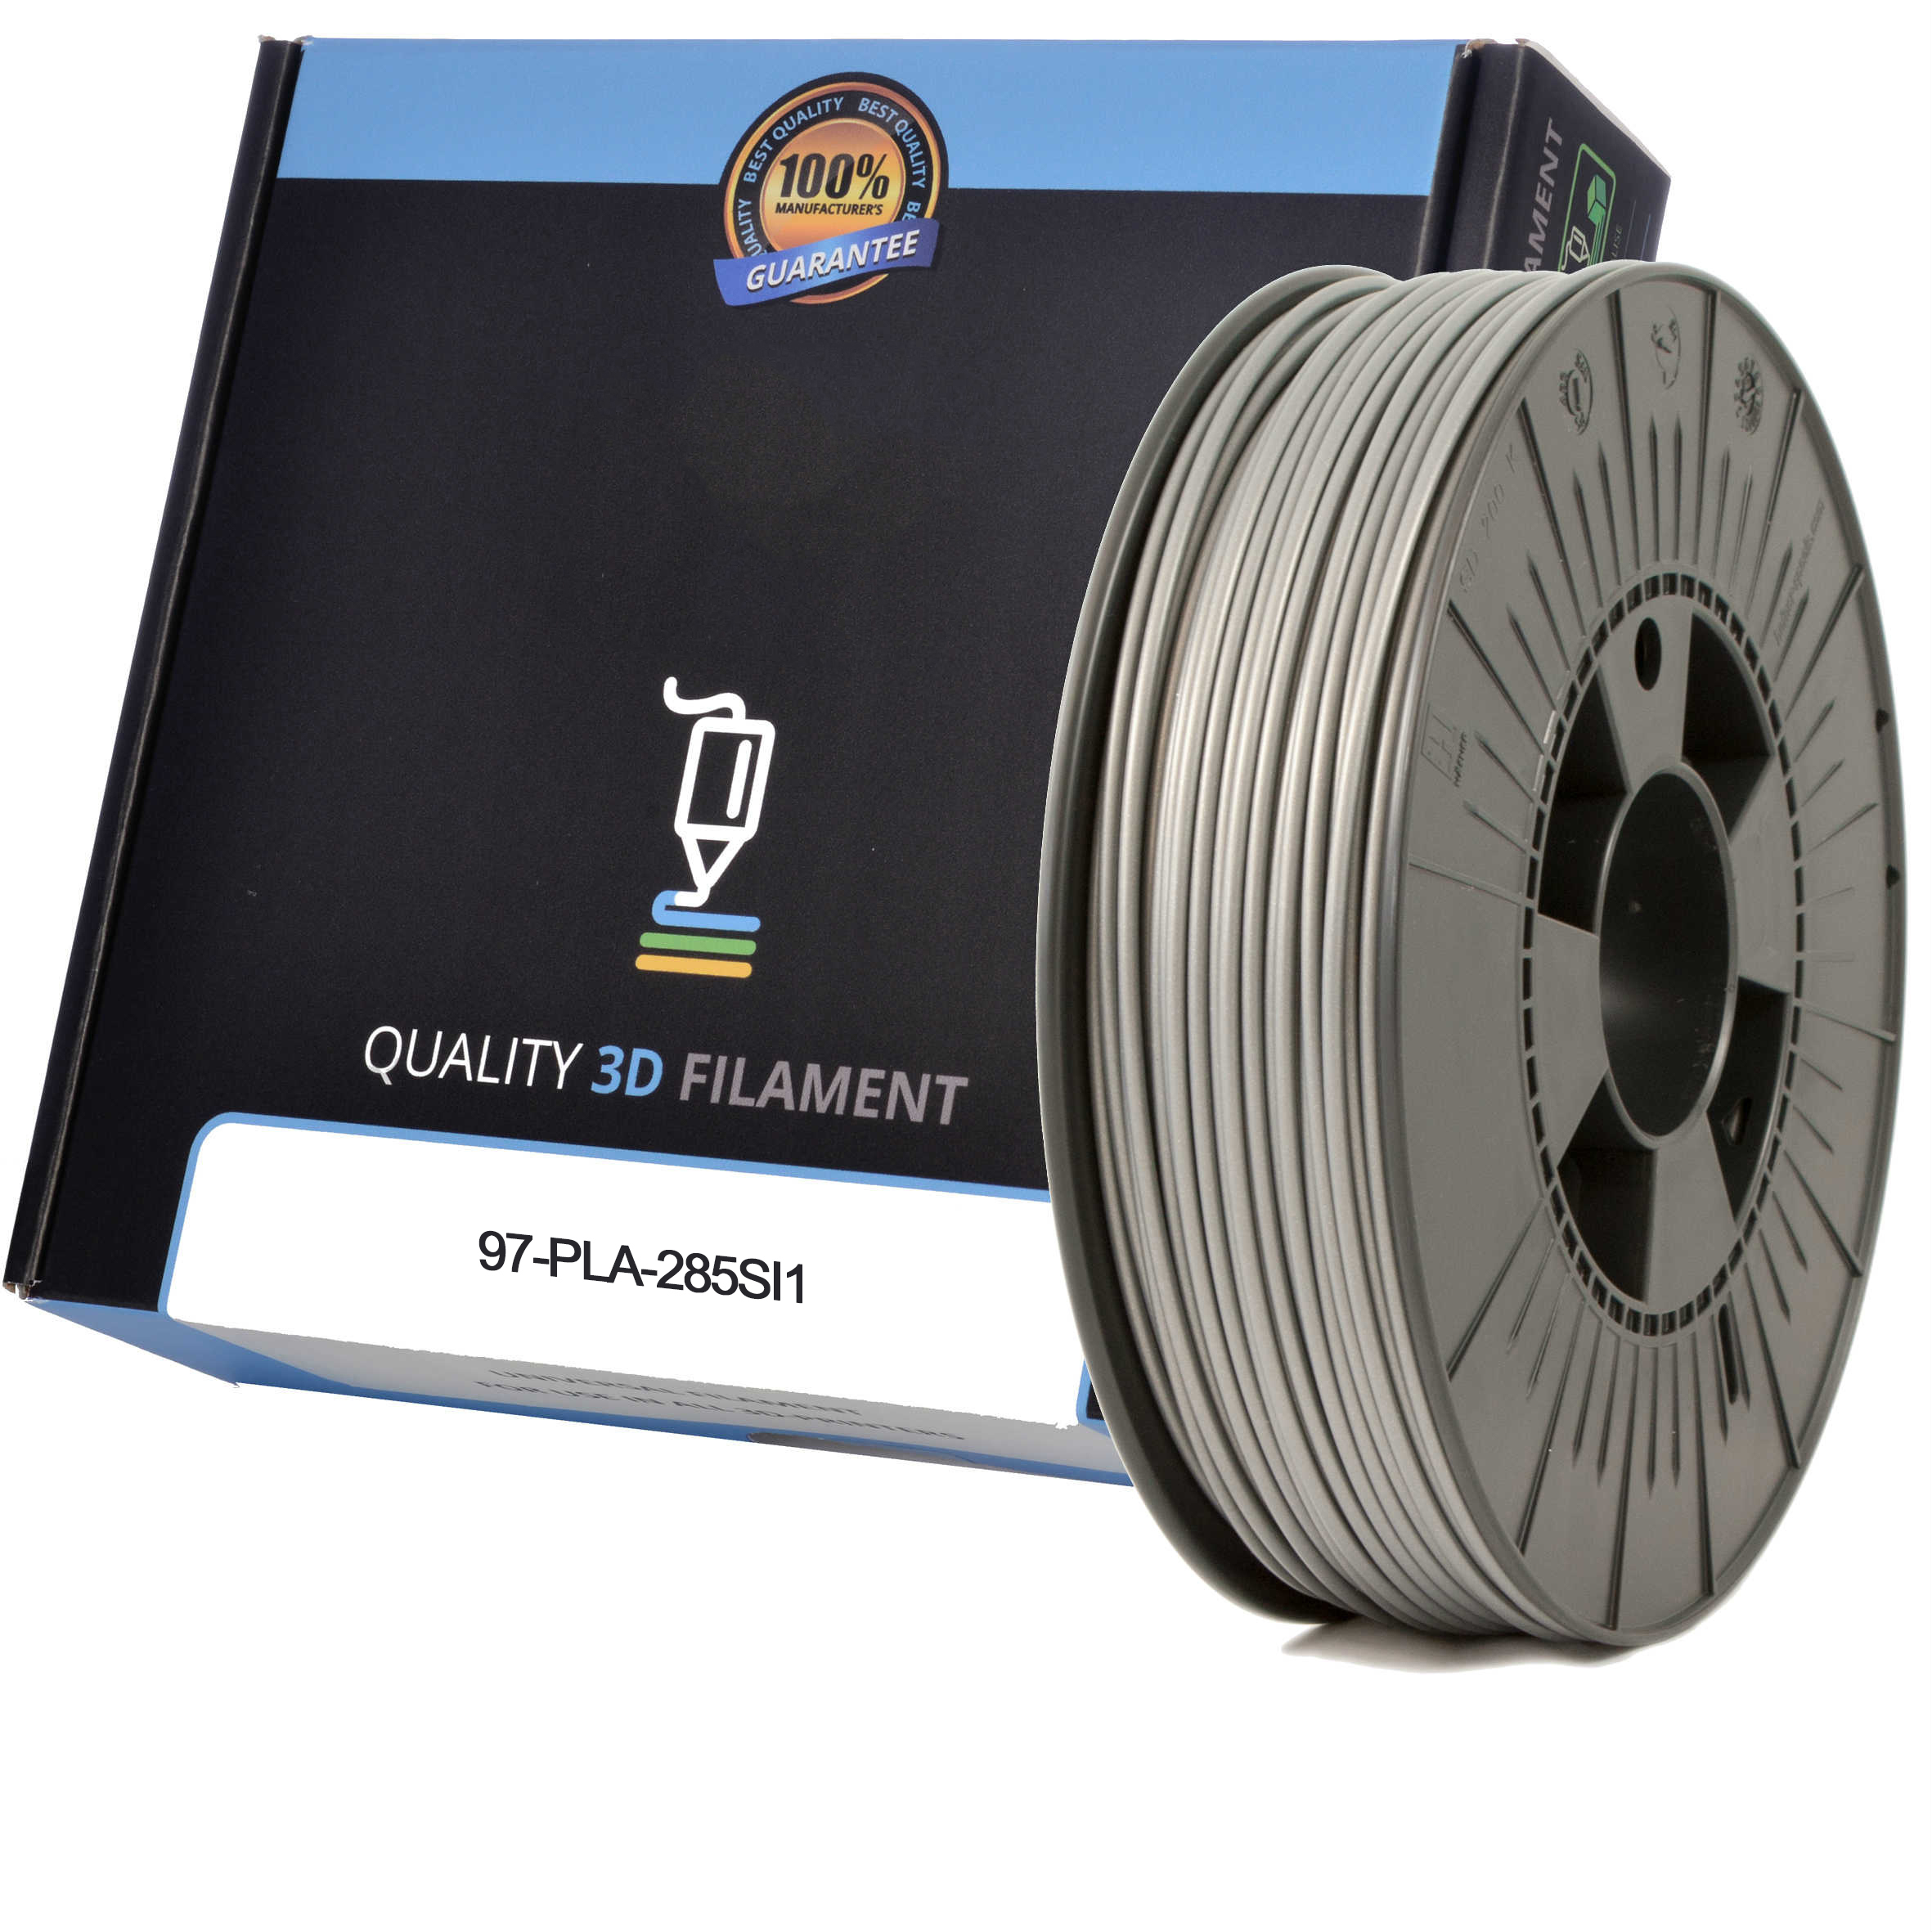 Premium Compatible PLA 2.85mm Silver 1kg 3D Filament (97-PLA-285SI1)